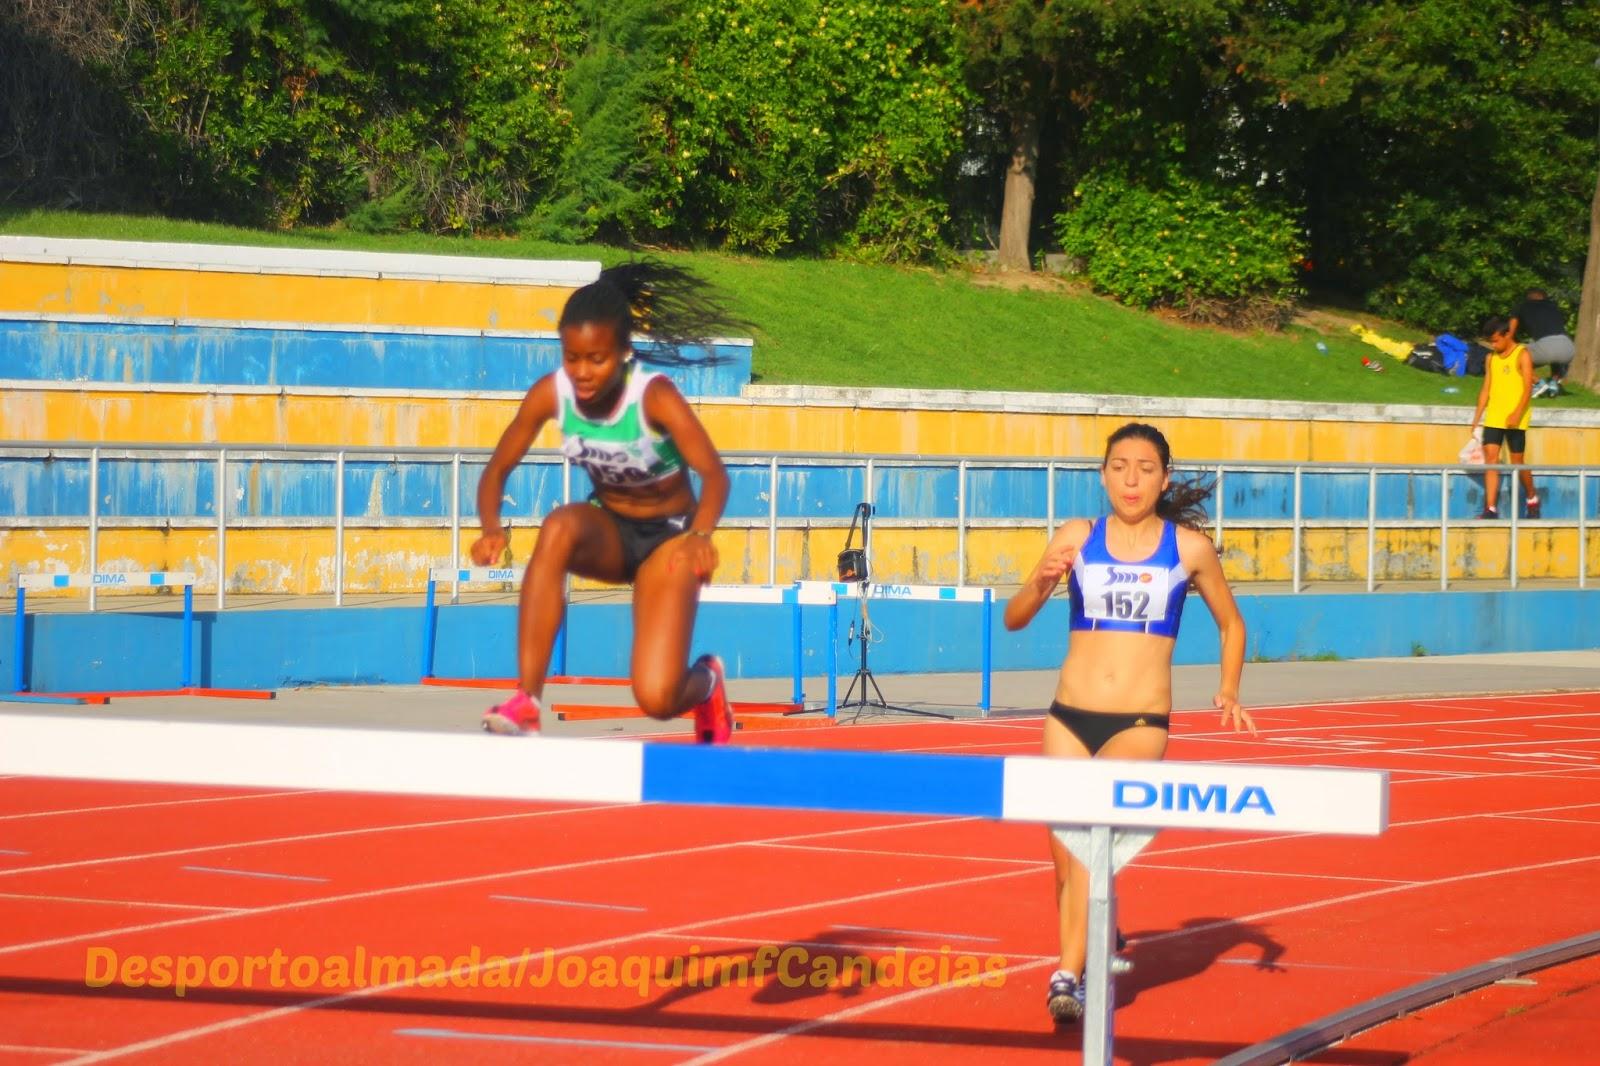 Despique renhido entre Maria Martins a ultrapassar a barreira e Inês Marques  que acabou por vencer e648f35b495e7